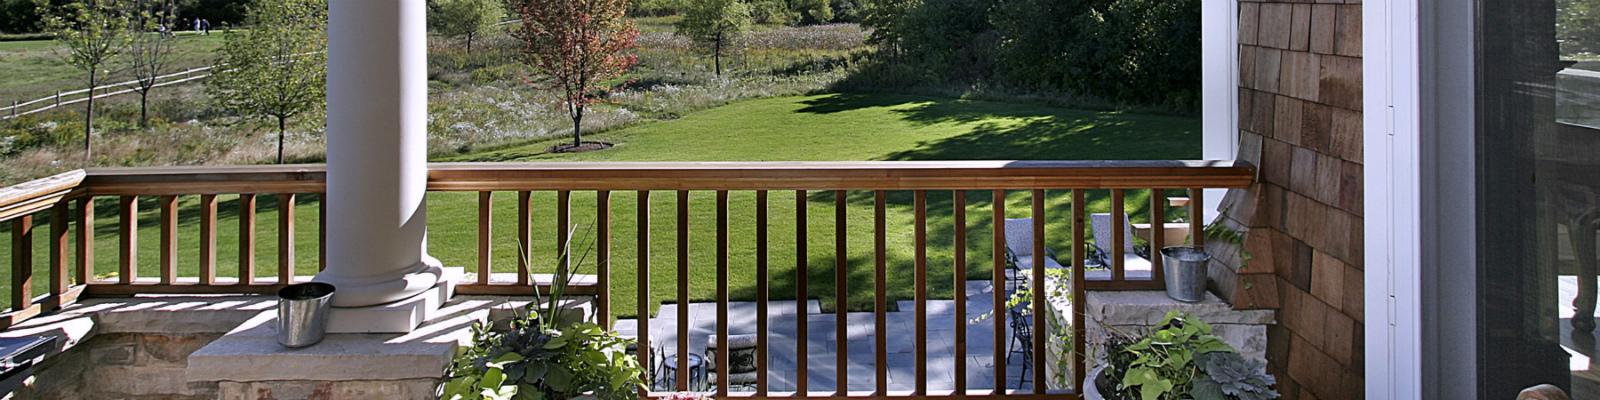 Rear deck overlooking green area